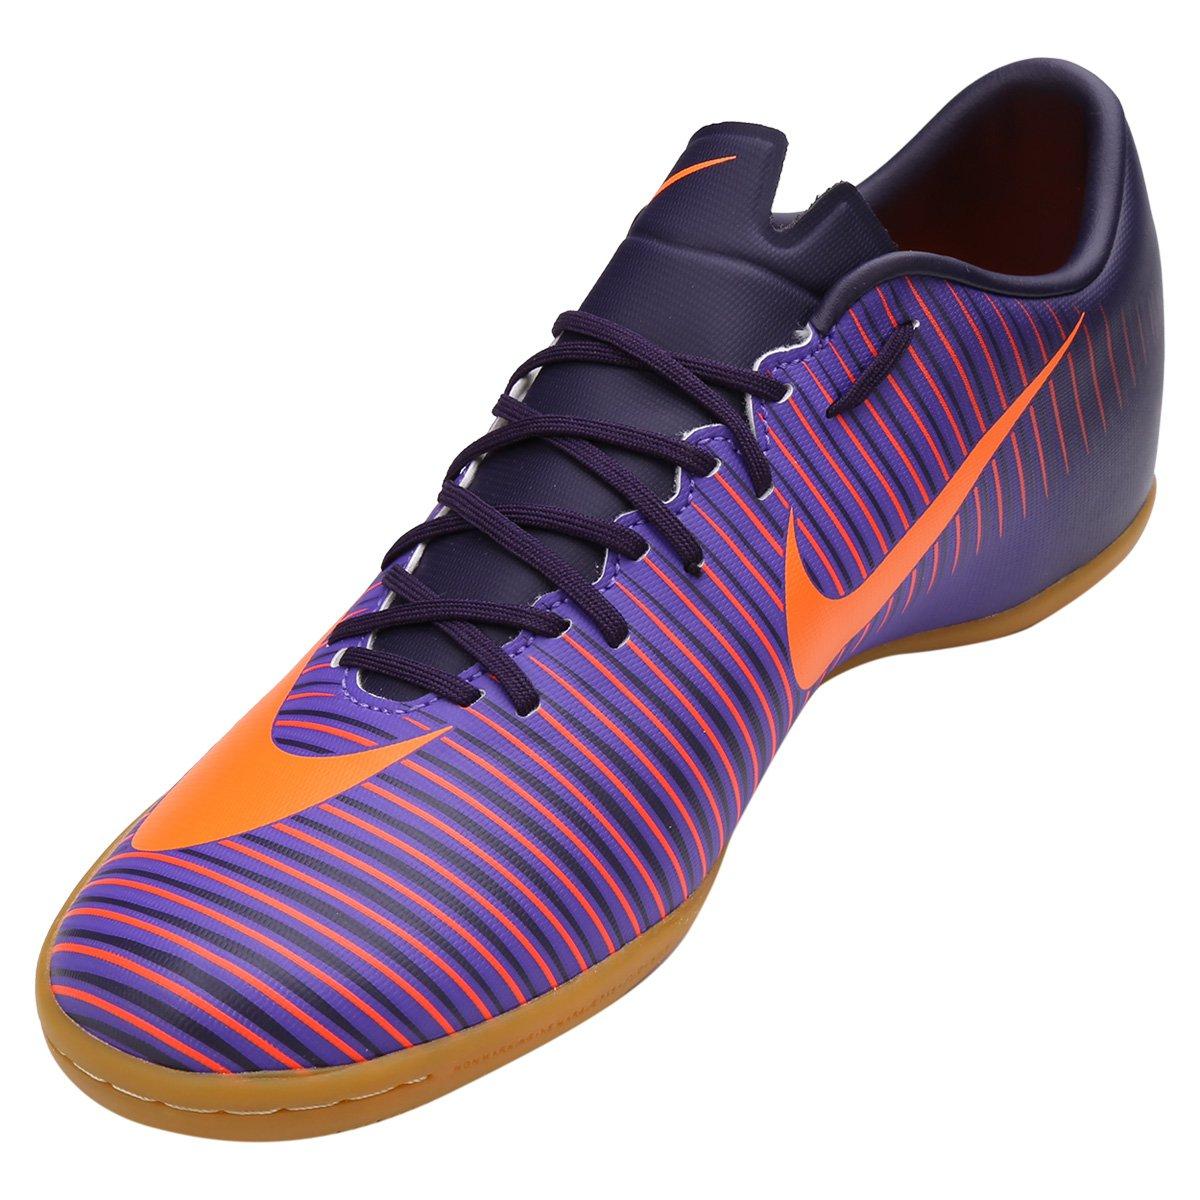 ab38467e69 Chuteira Futsal Nike Mercurial Victory 6 IC - Roxo - Compre Agora ...